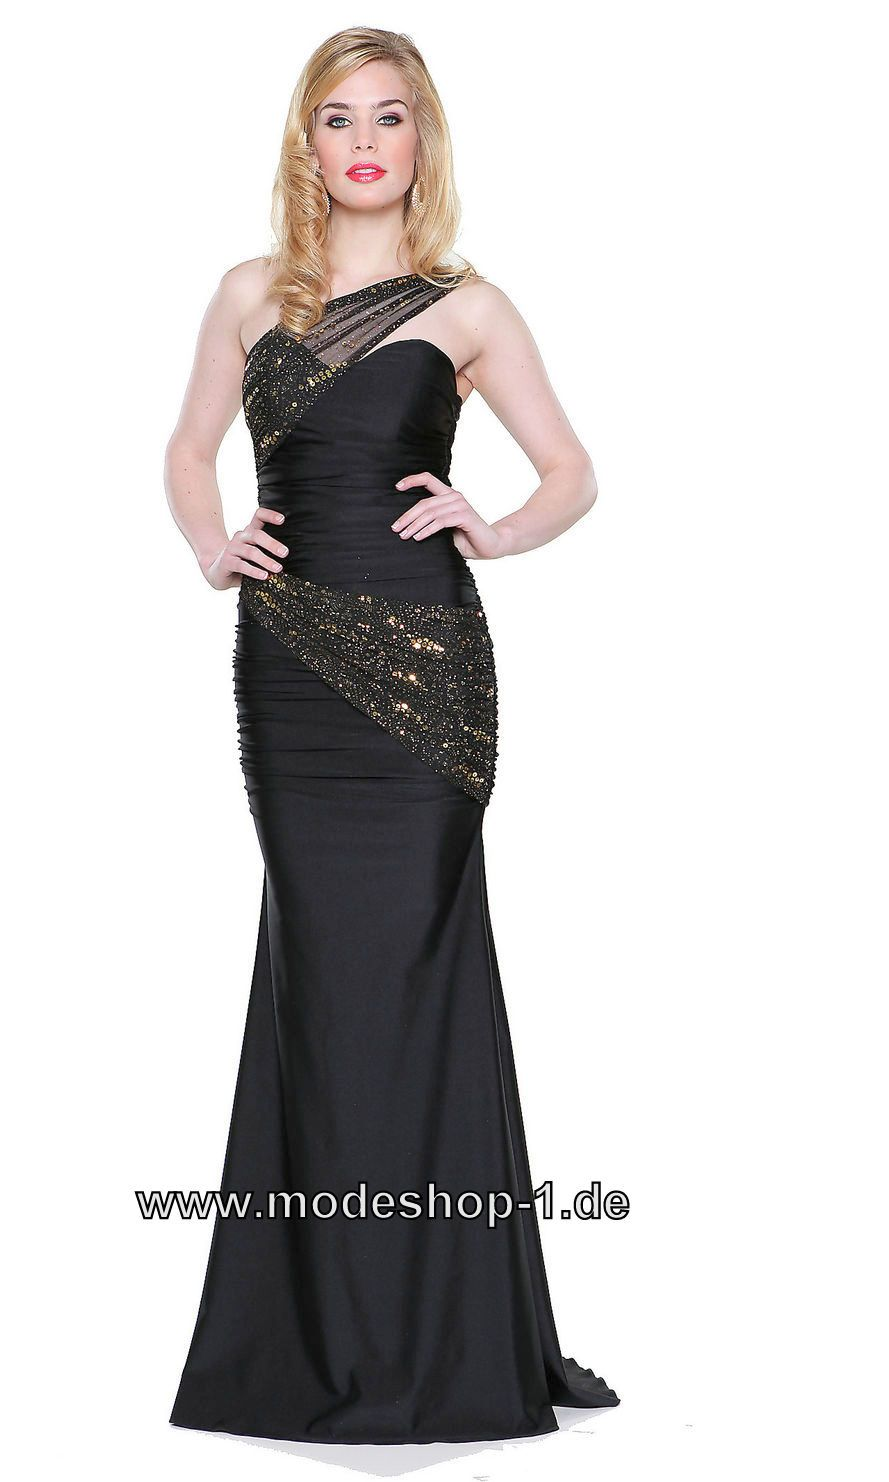 Diana Träger Abendkleid Lang in Schwarz 149 € www.modeshop-1.de ...